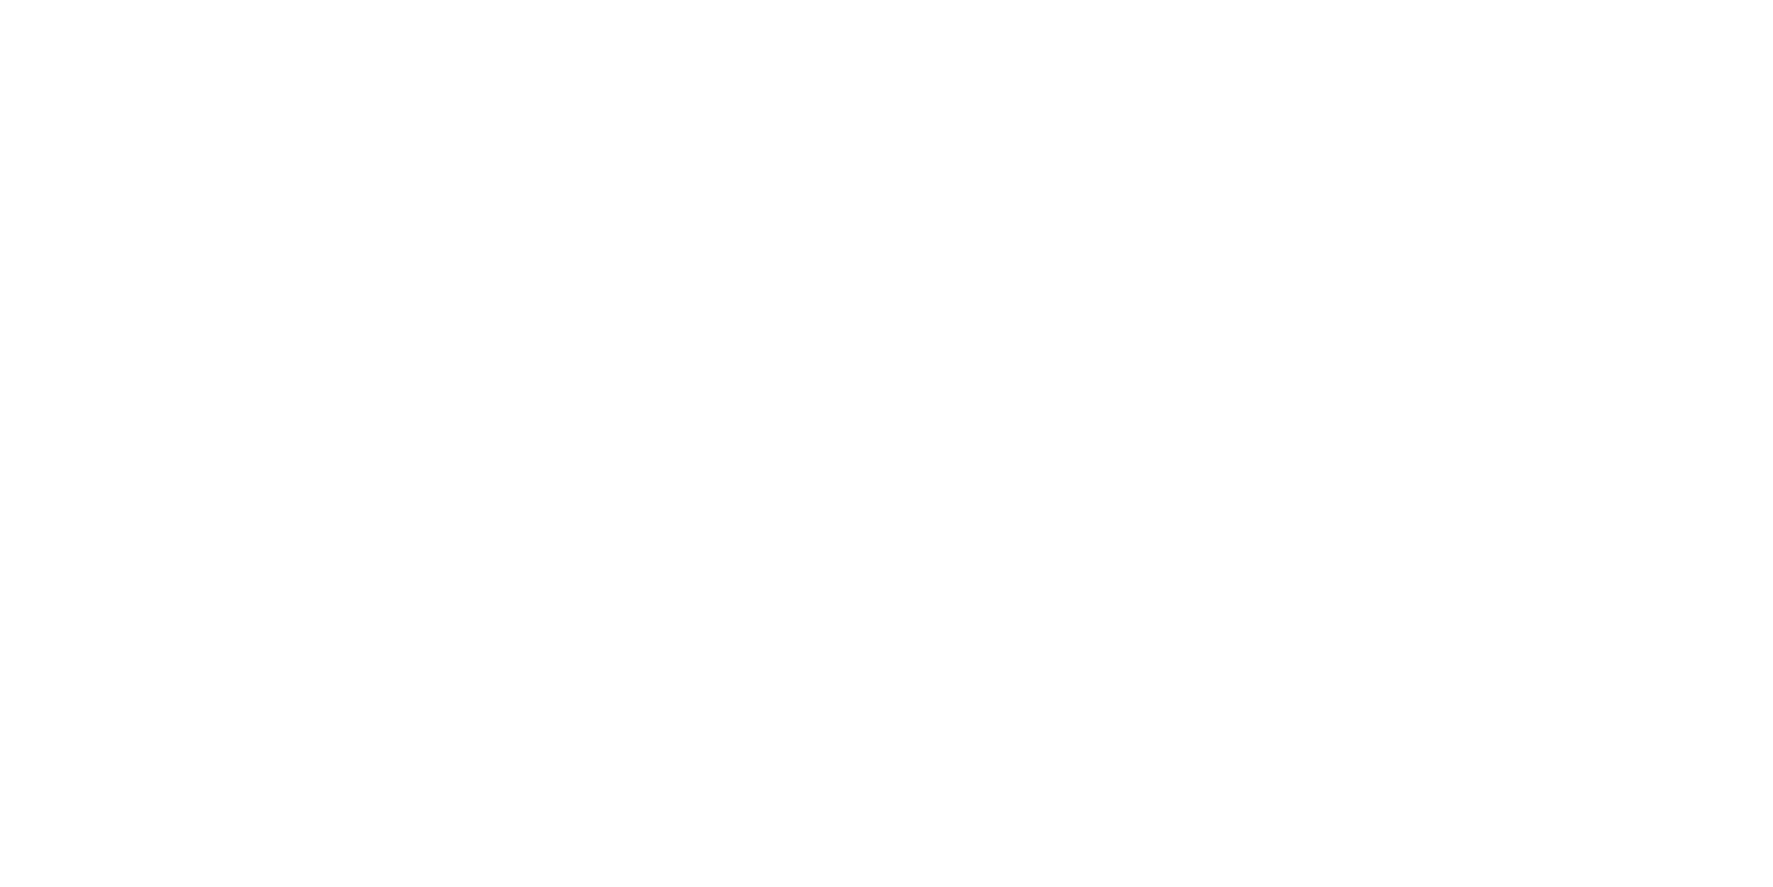 Maker Kluang